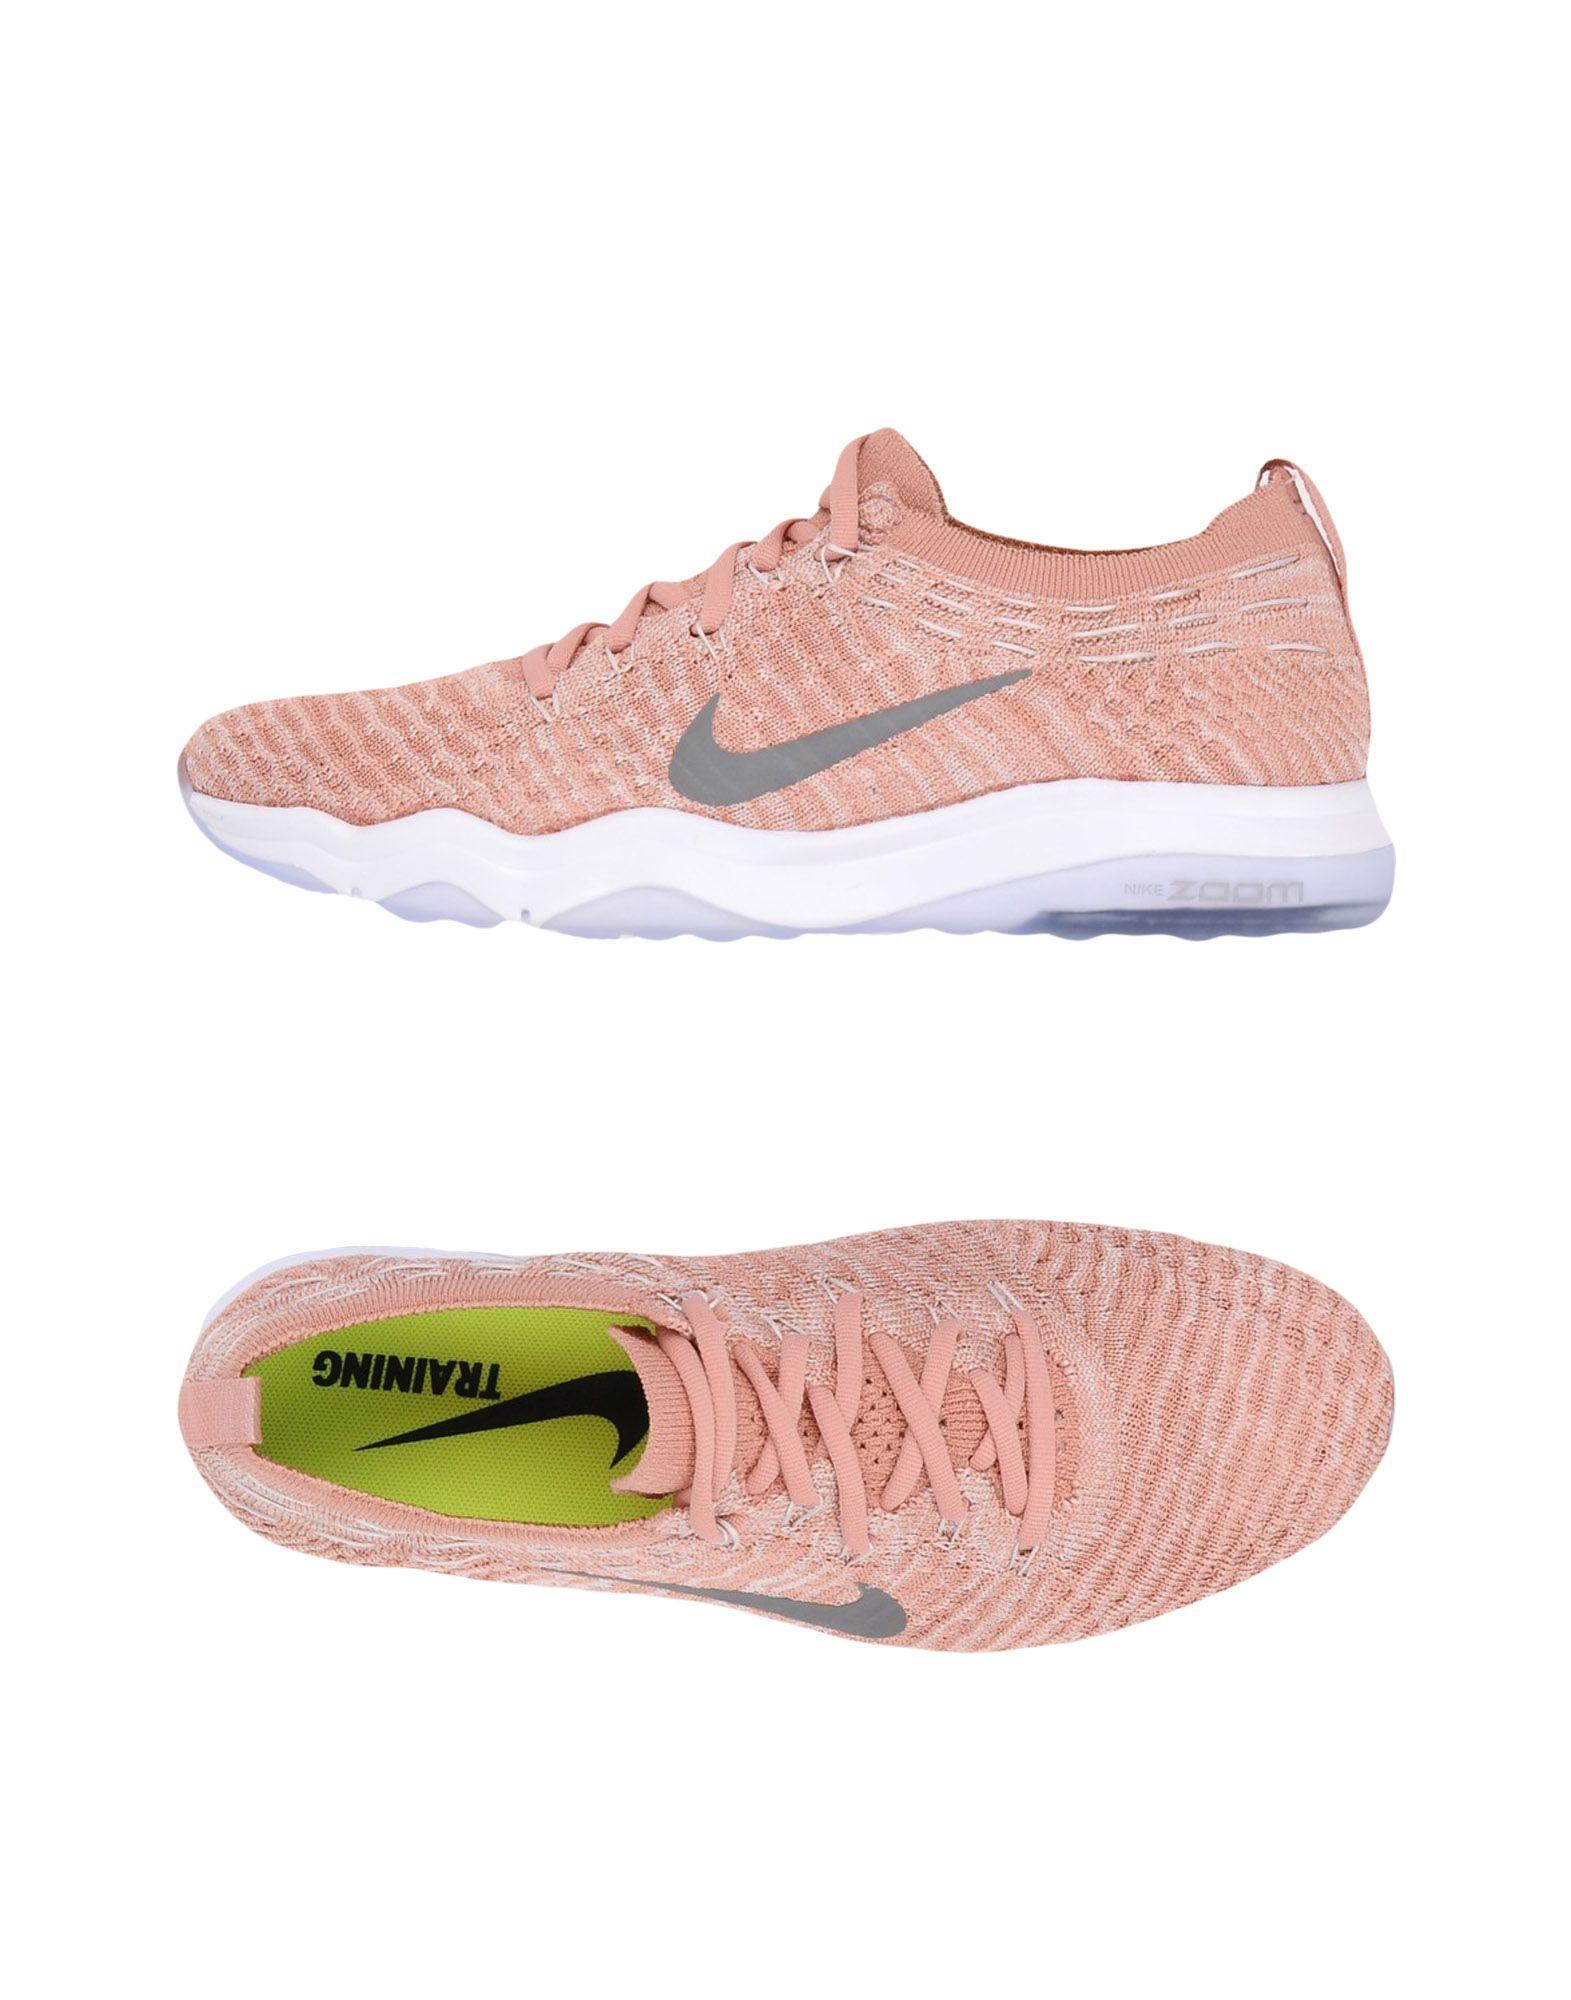 Nike  Air Zoom Fearless Fk Lux  11431575SS Gute Qualität beliebte Schuhe